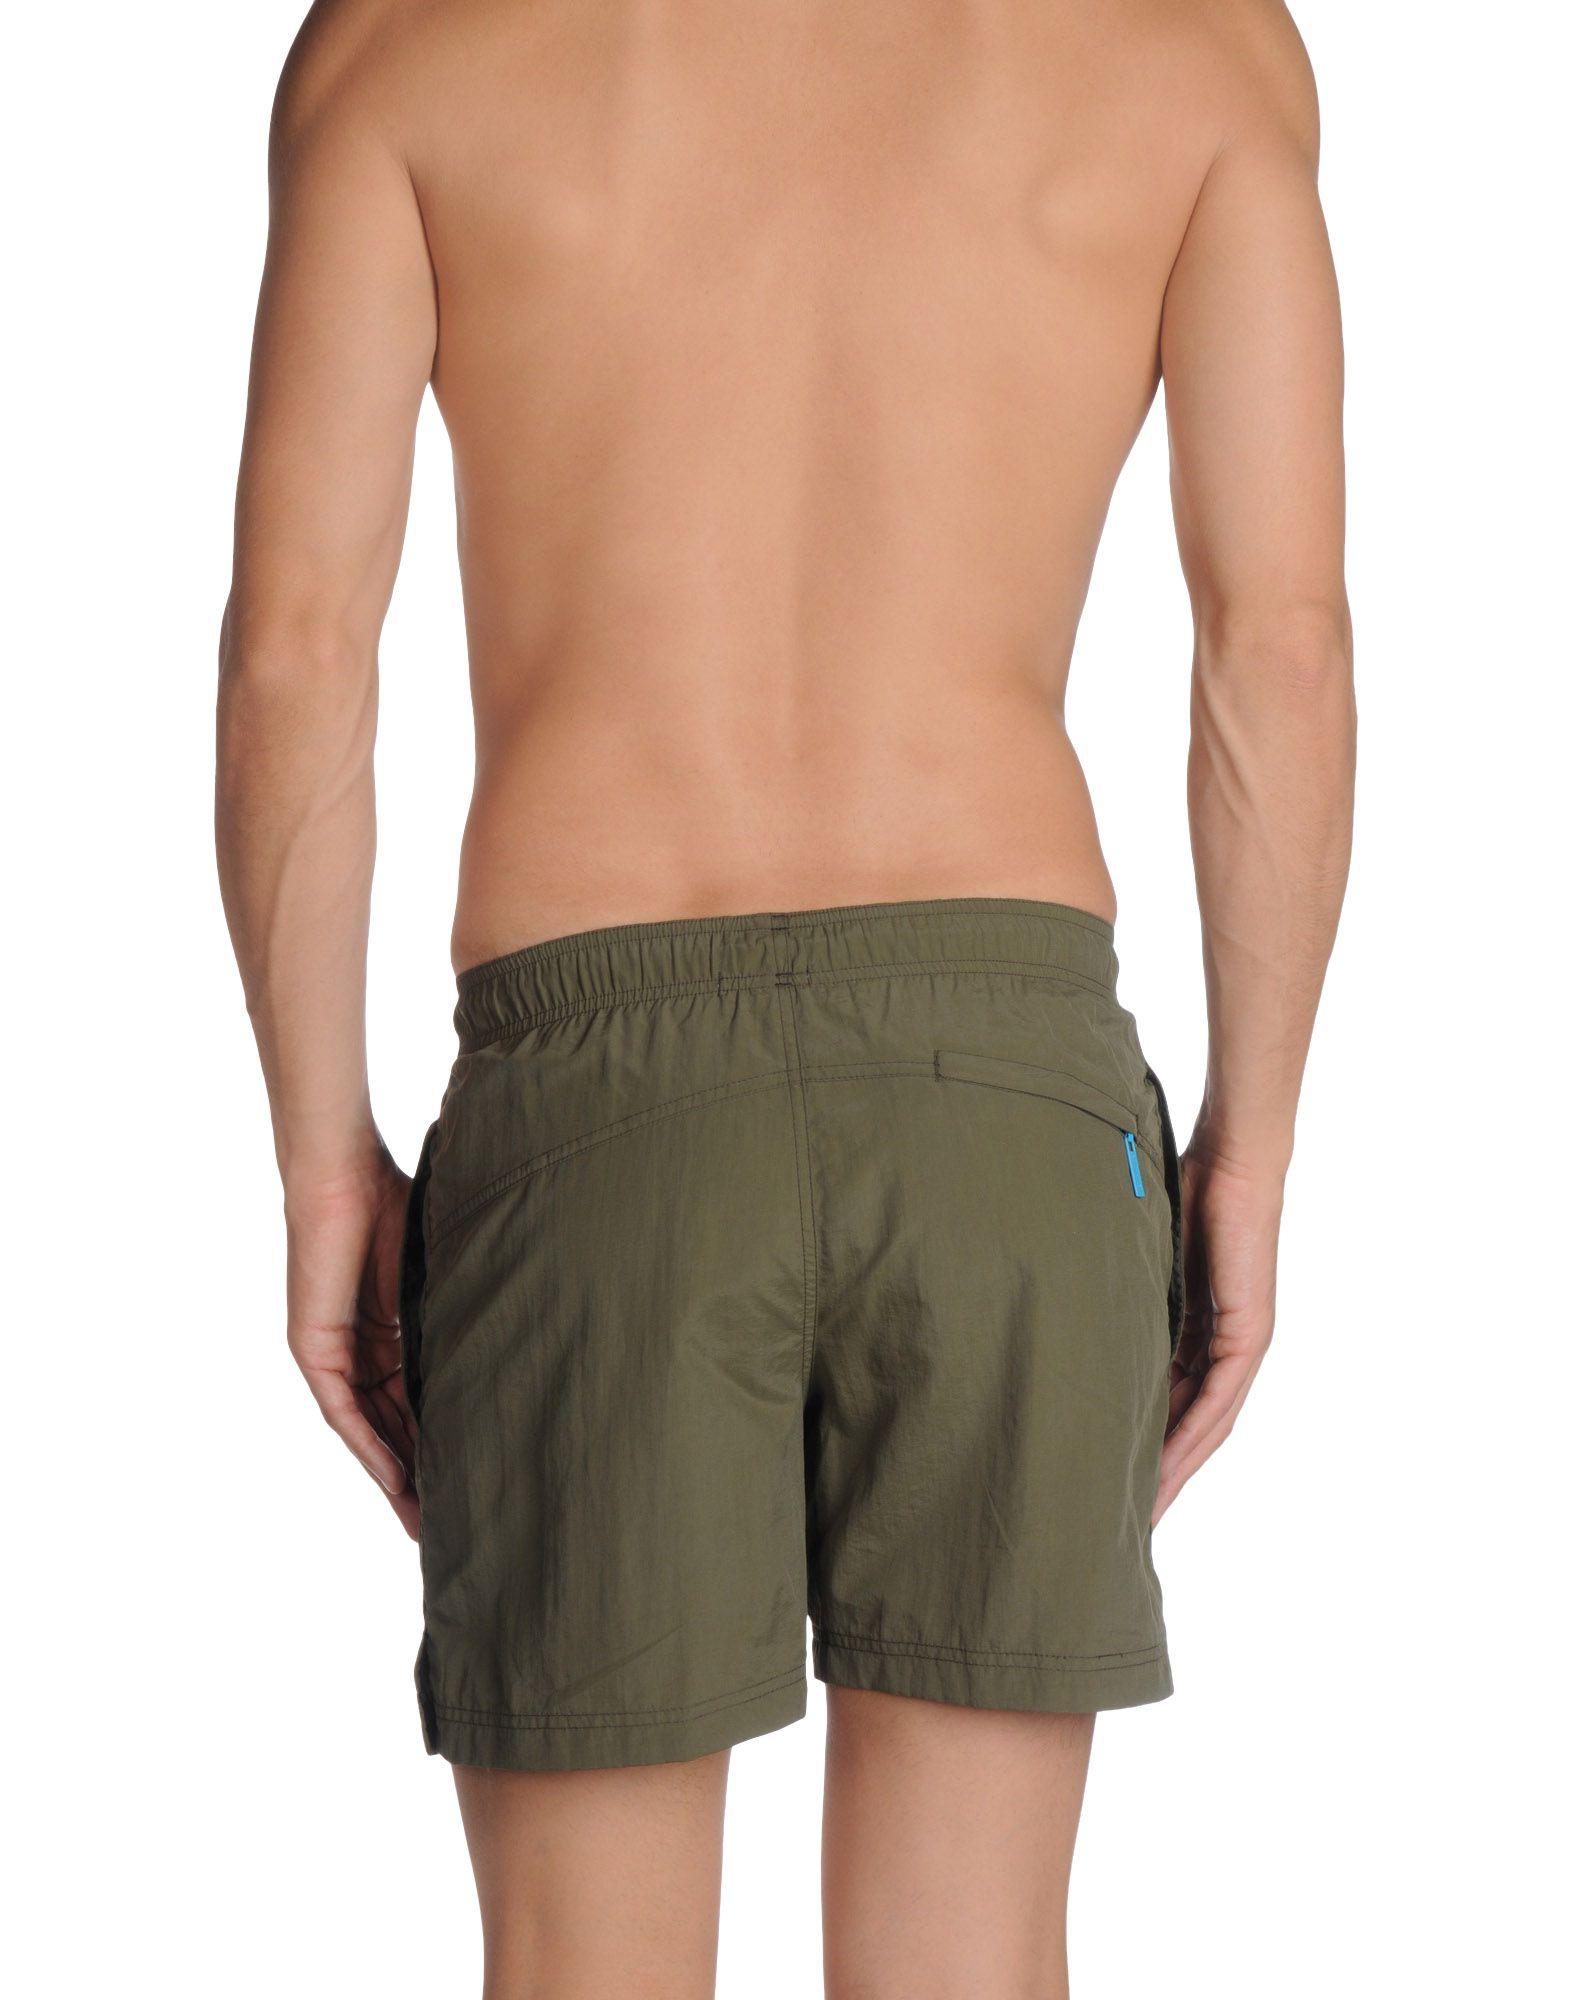 lyst calvin klein swim trunks in green for men. Black Bedroom Furniture Sets. Home Design Ideas